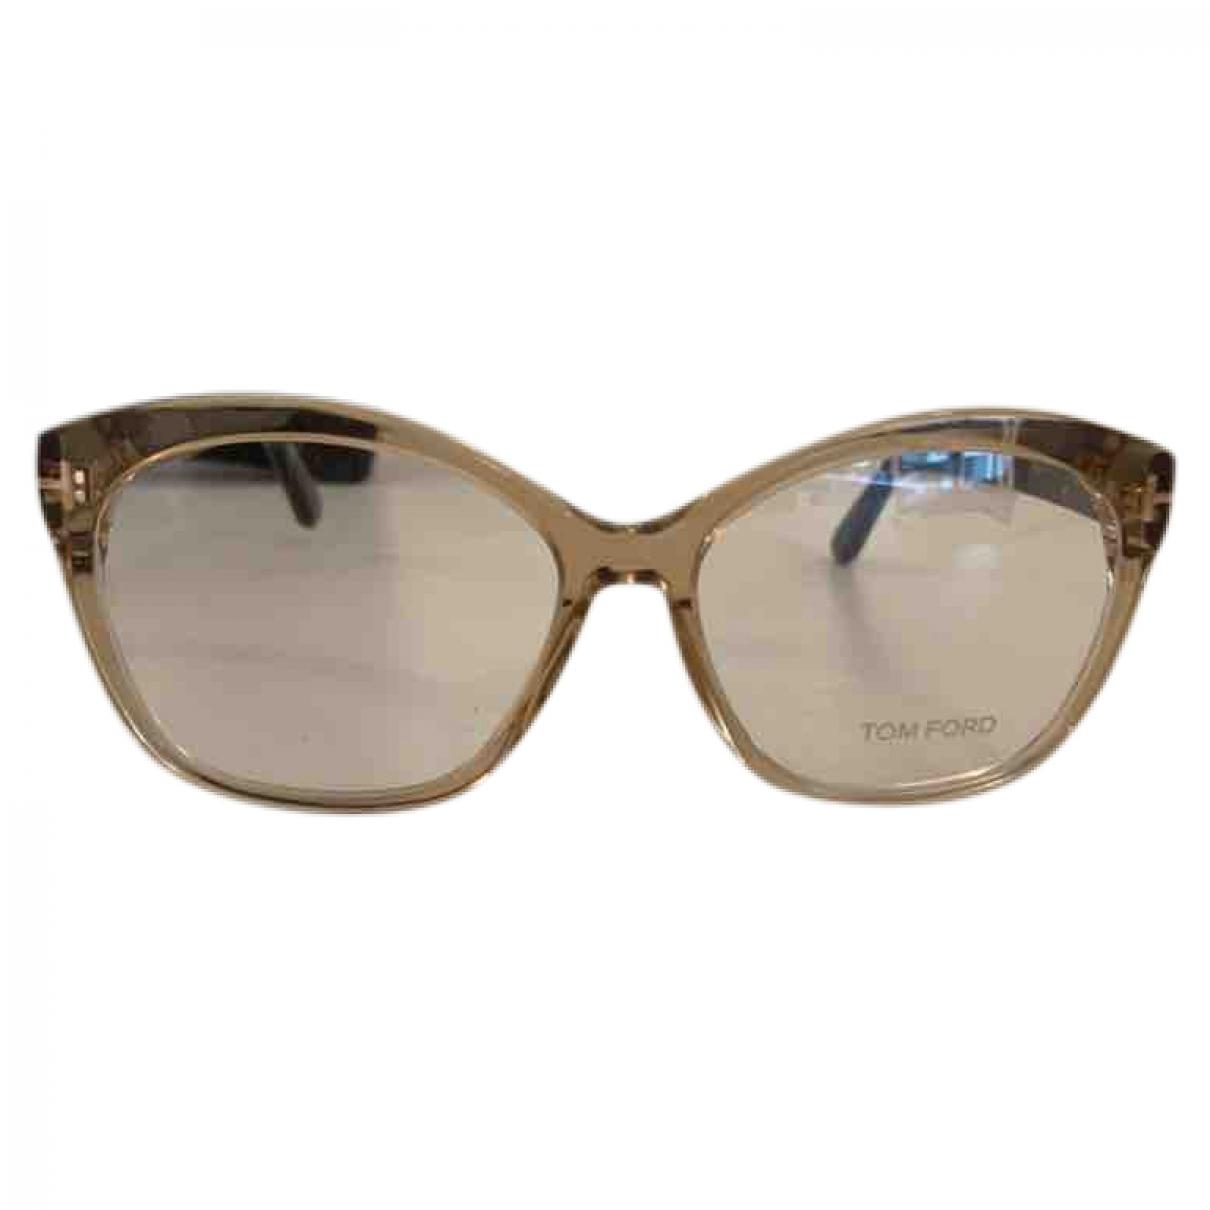 Tom Ford - Lunettes   pour femme - beige